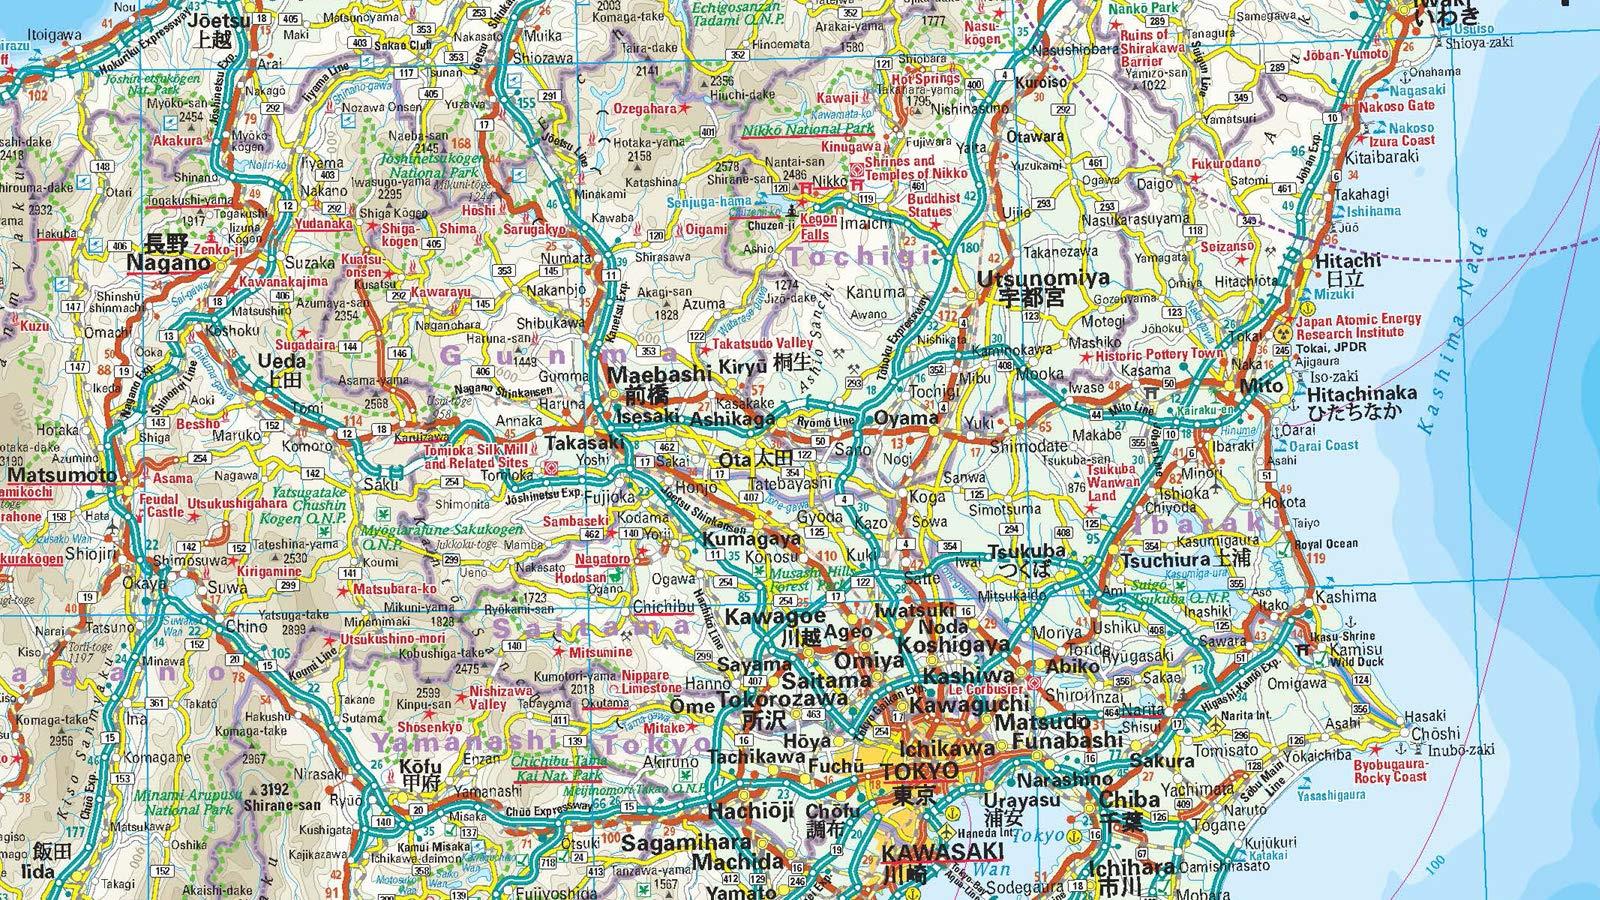 Japón, mapa impermeable de carreteras. Escala 1:1.200.000. Reise Know-How. Reise Know-How Verlag: Amazon.es: VV.AA.: Libros